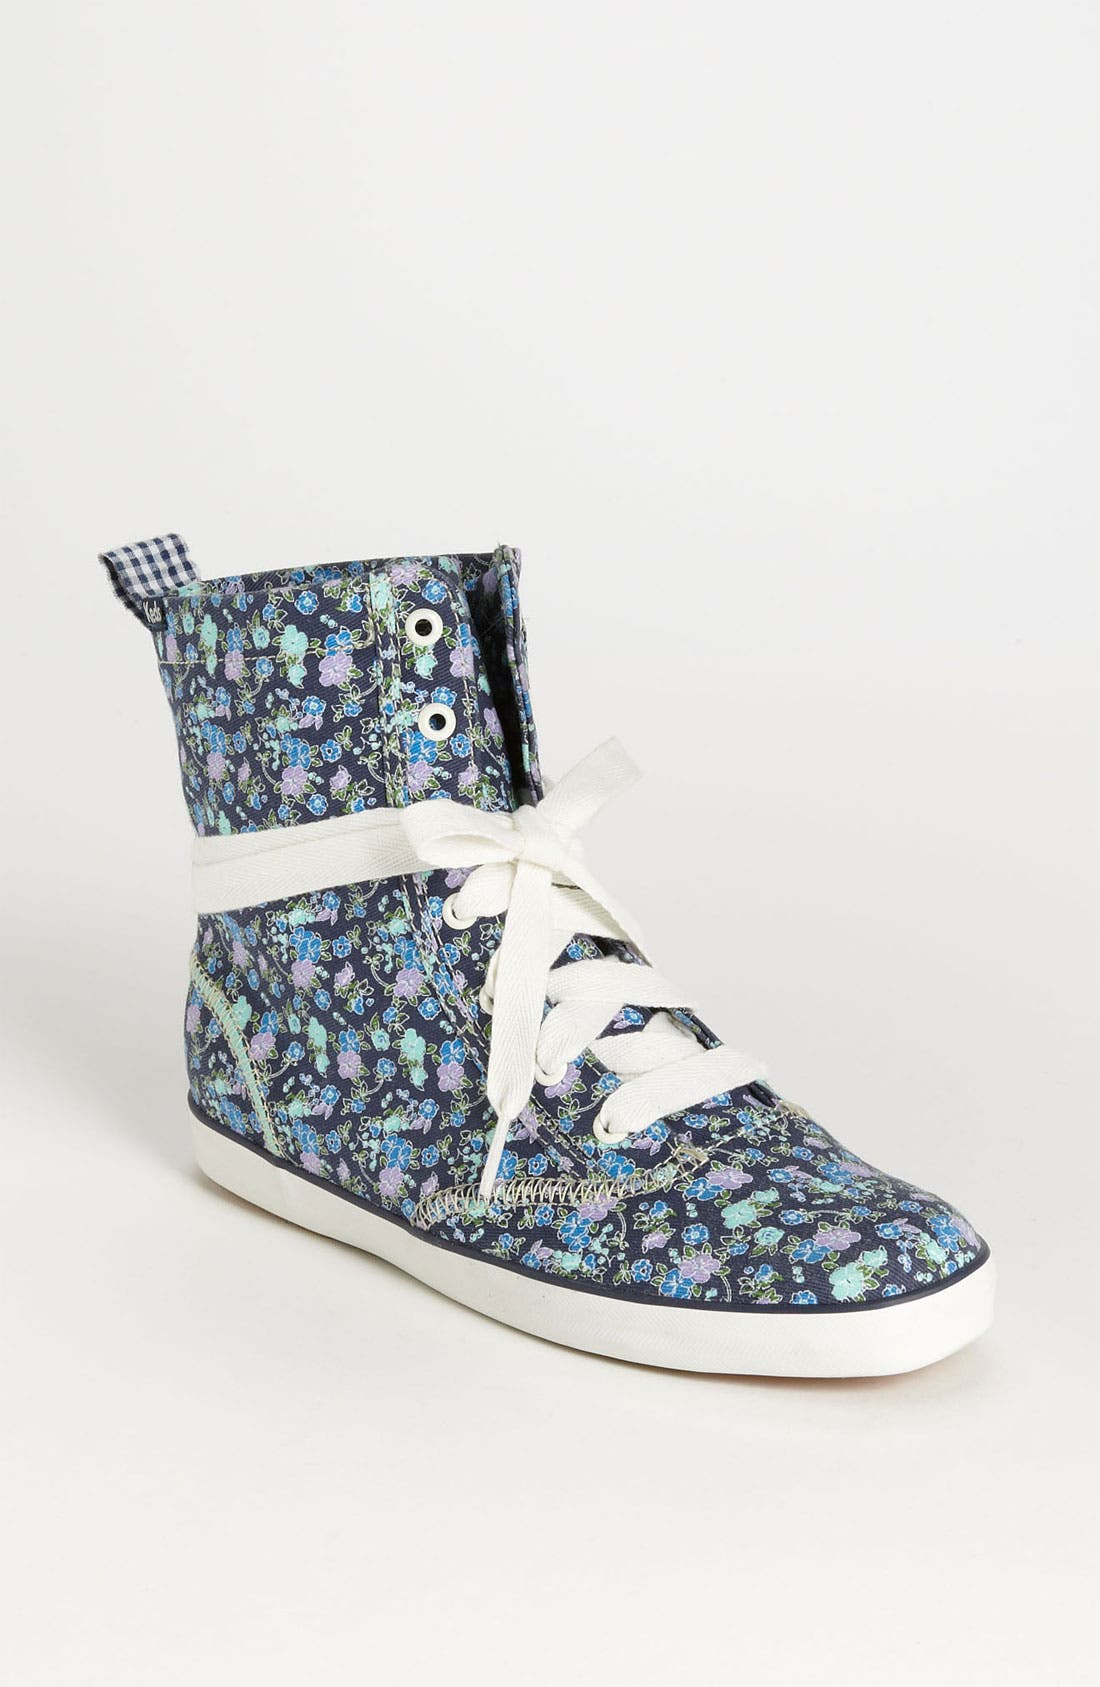 Main Image - Keds® 'January' Sneaker Boot (Women)